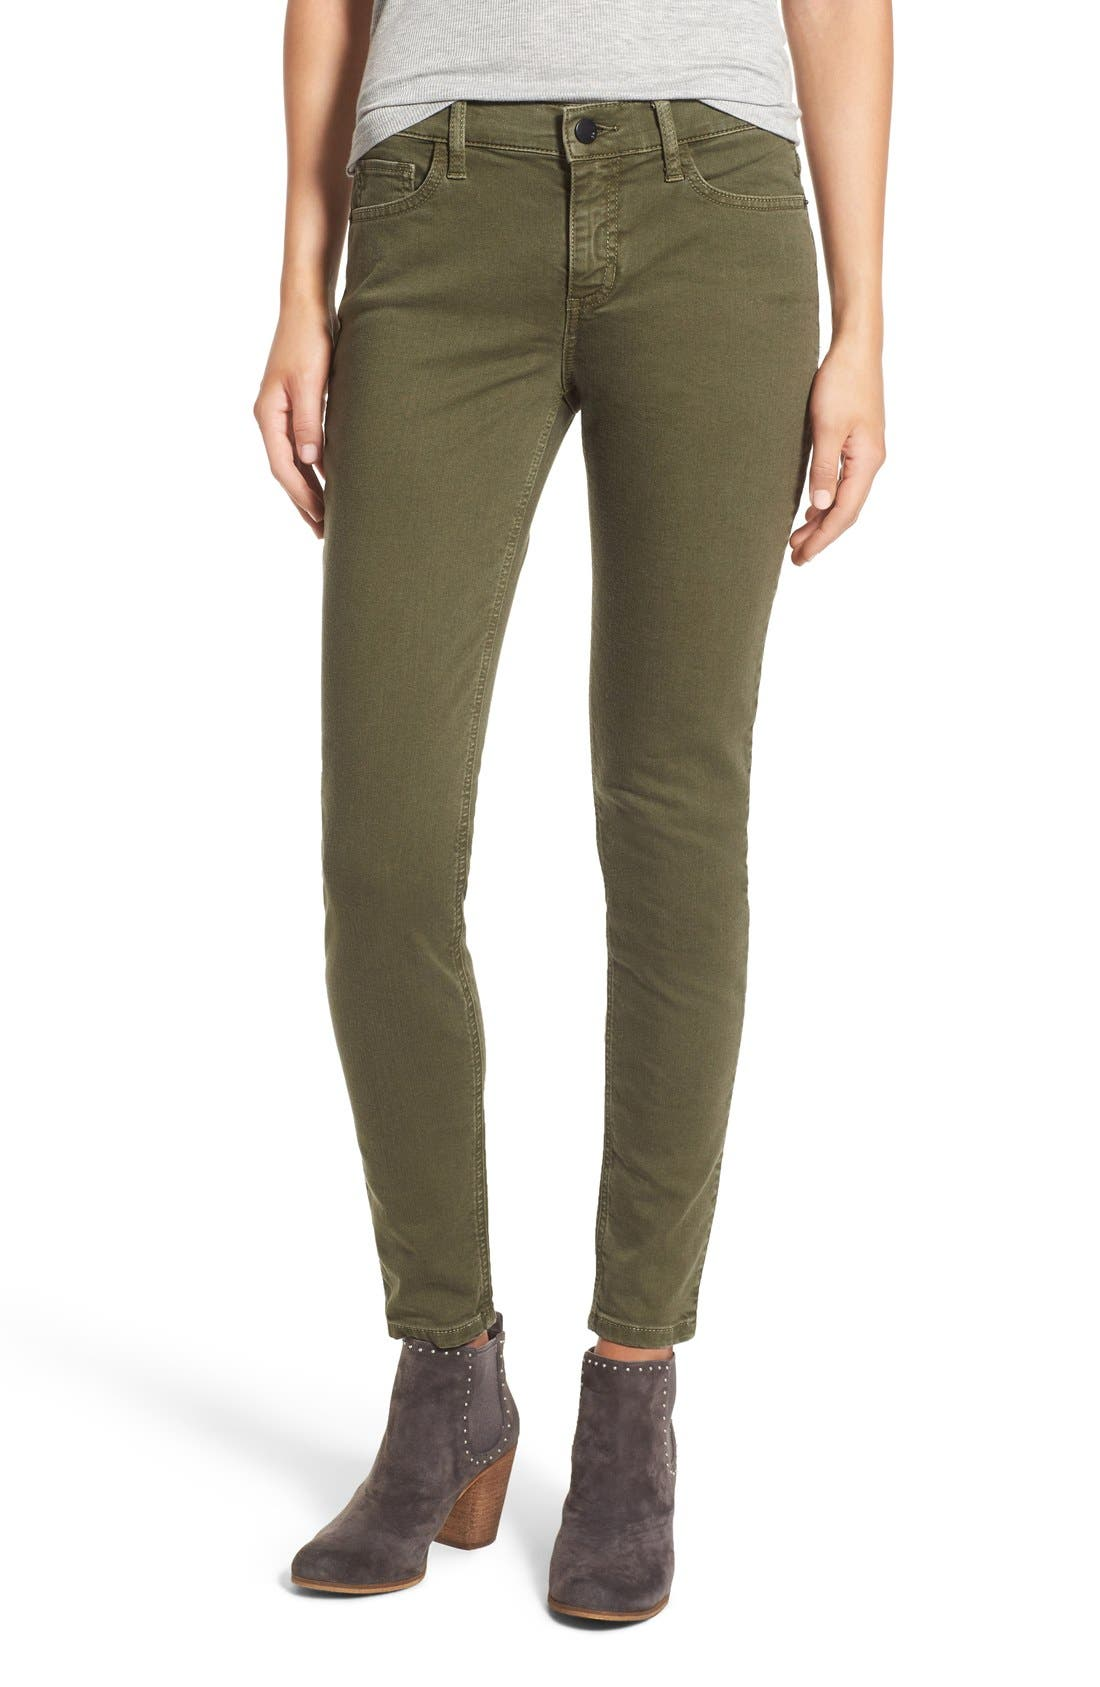 Alternate Image 1 Selected - SP Black Stretch Cotton Skinny Jeans